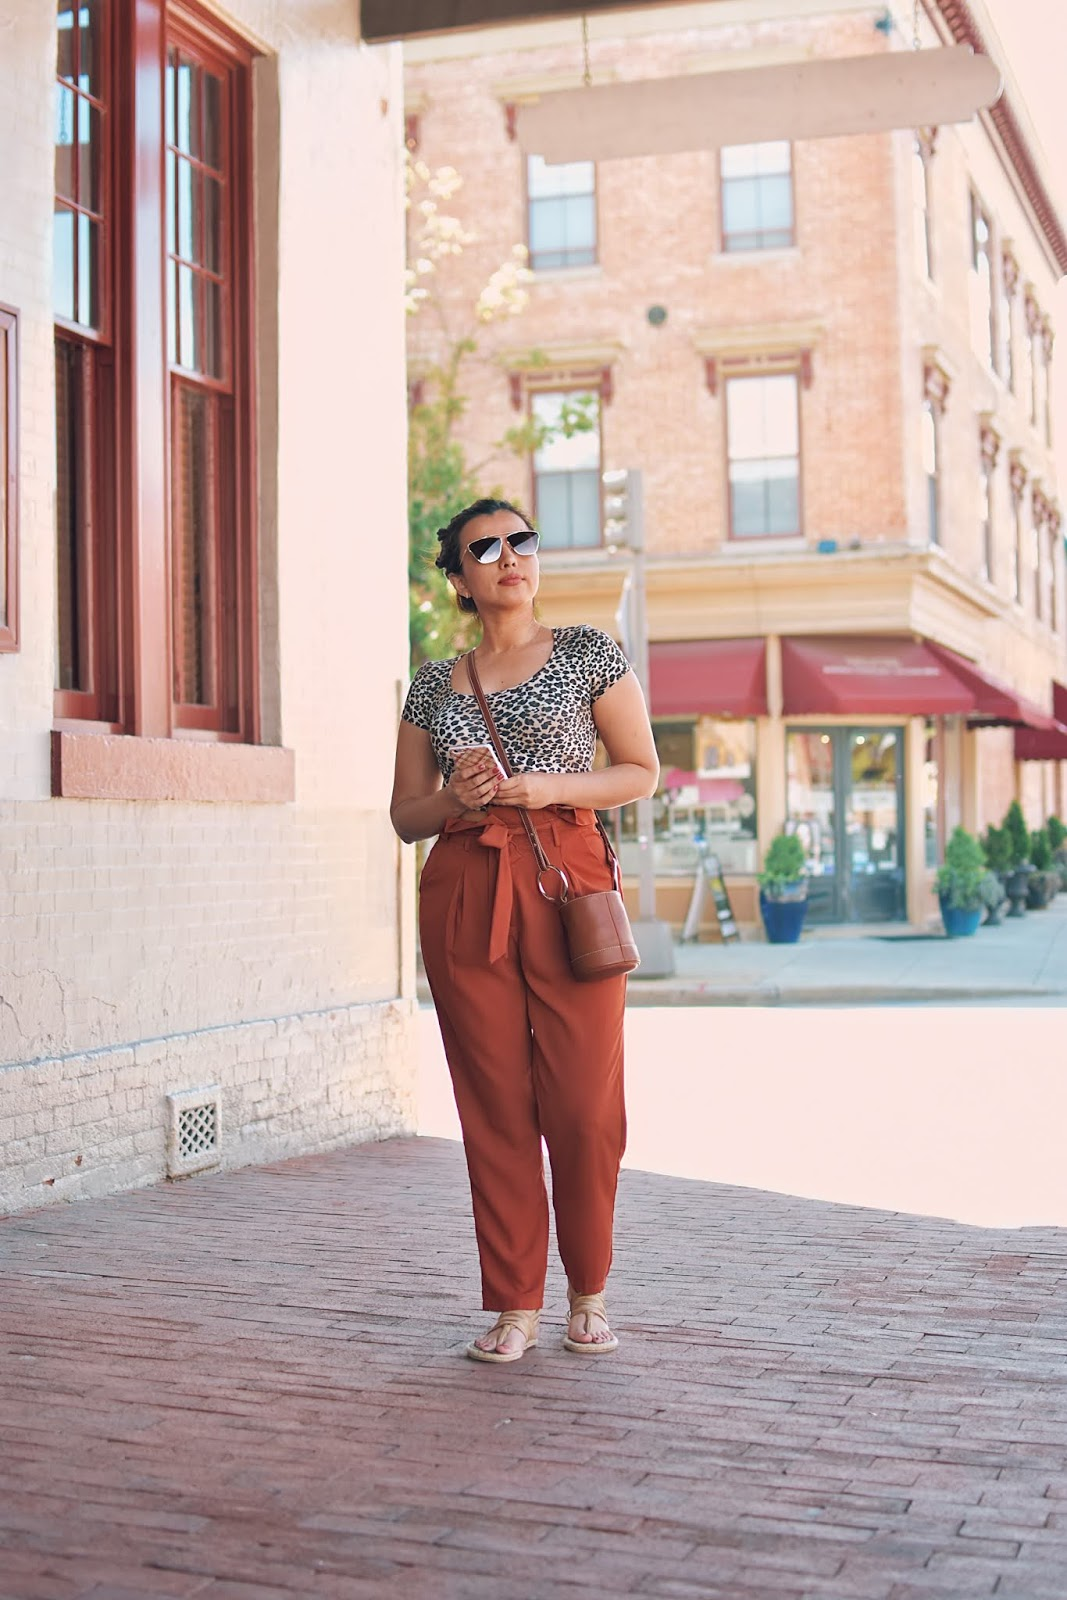 Una Pequeña Dosis De Estampado Animal-mariestilo-sheingals-shein-dcblogger-fashionblogger-modaelsalvador-armandhugon-fashionista-look of the day-